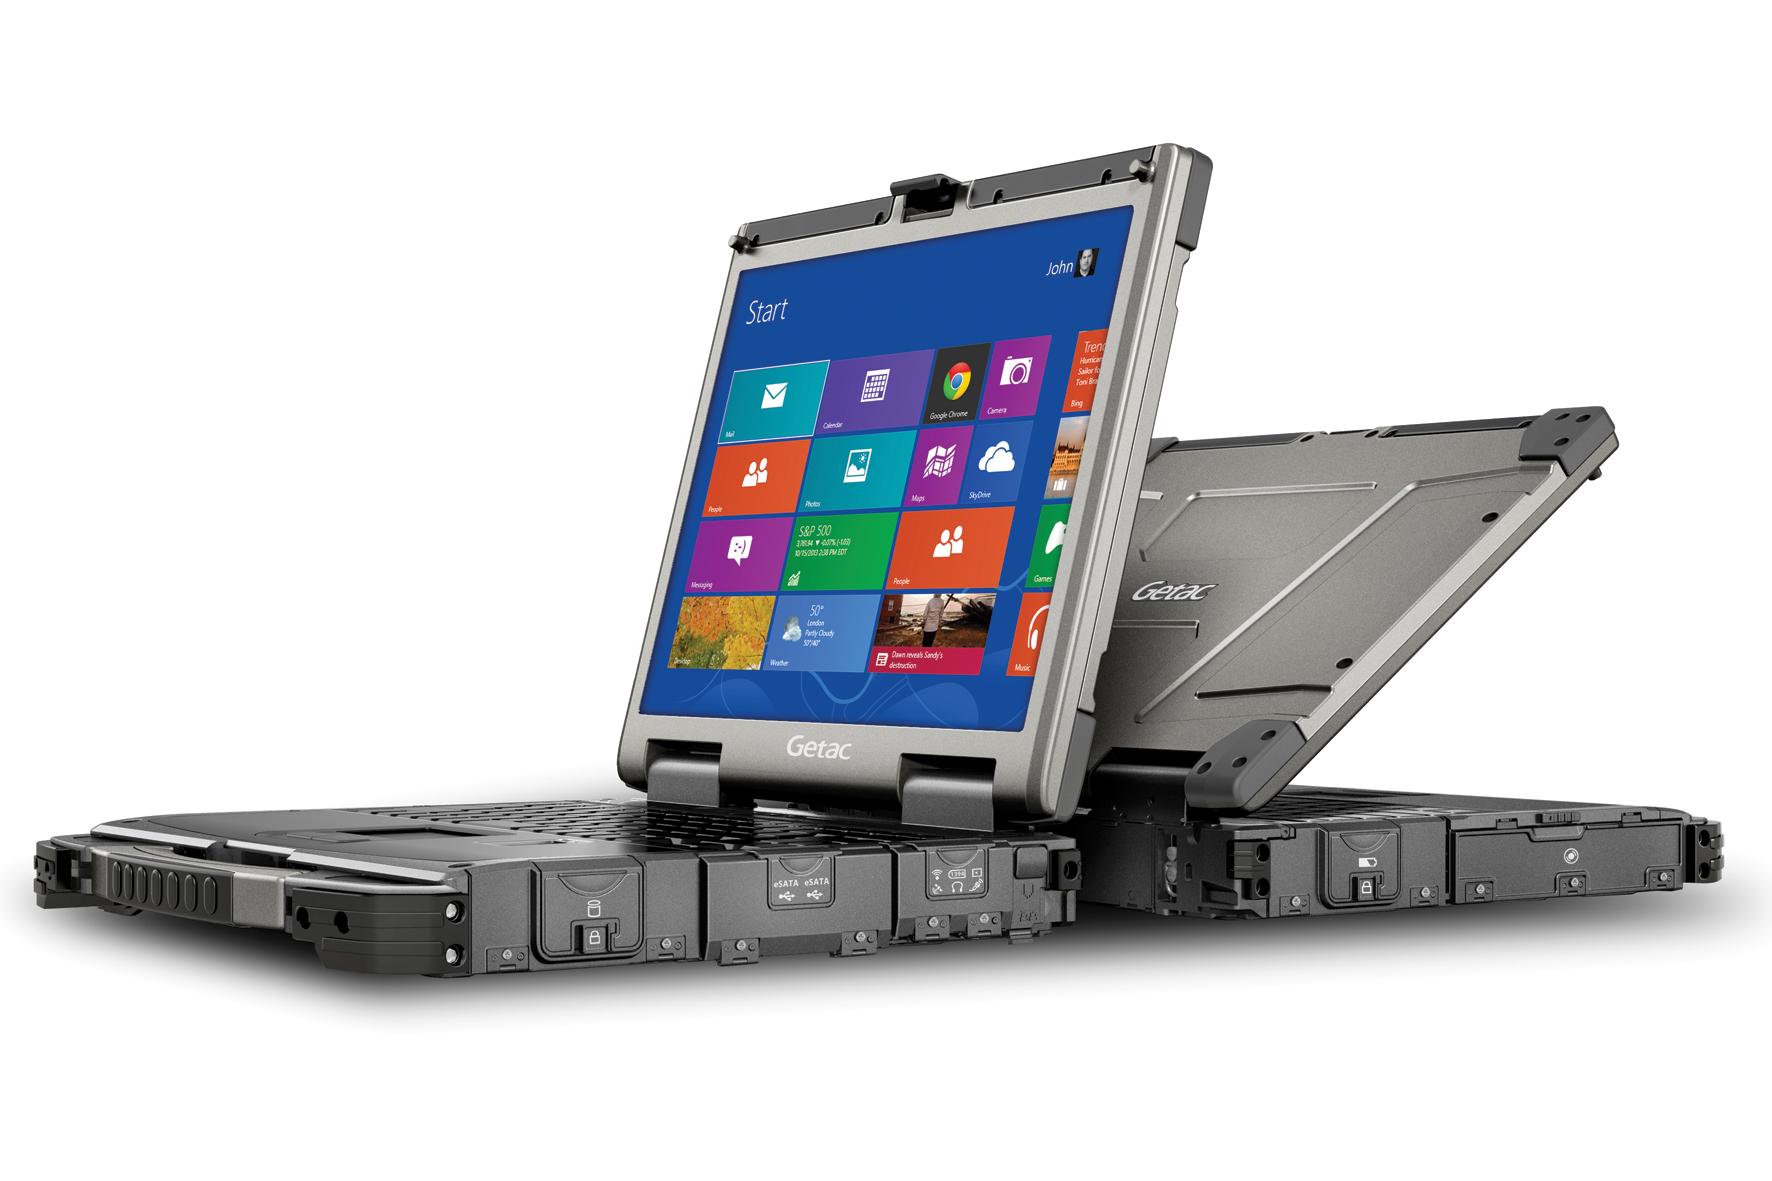 Notebooki i tablety rugged: integrator filarem rynku